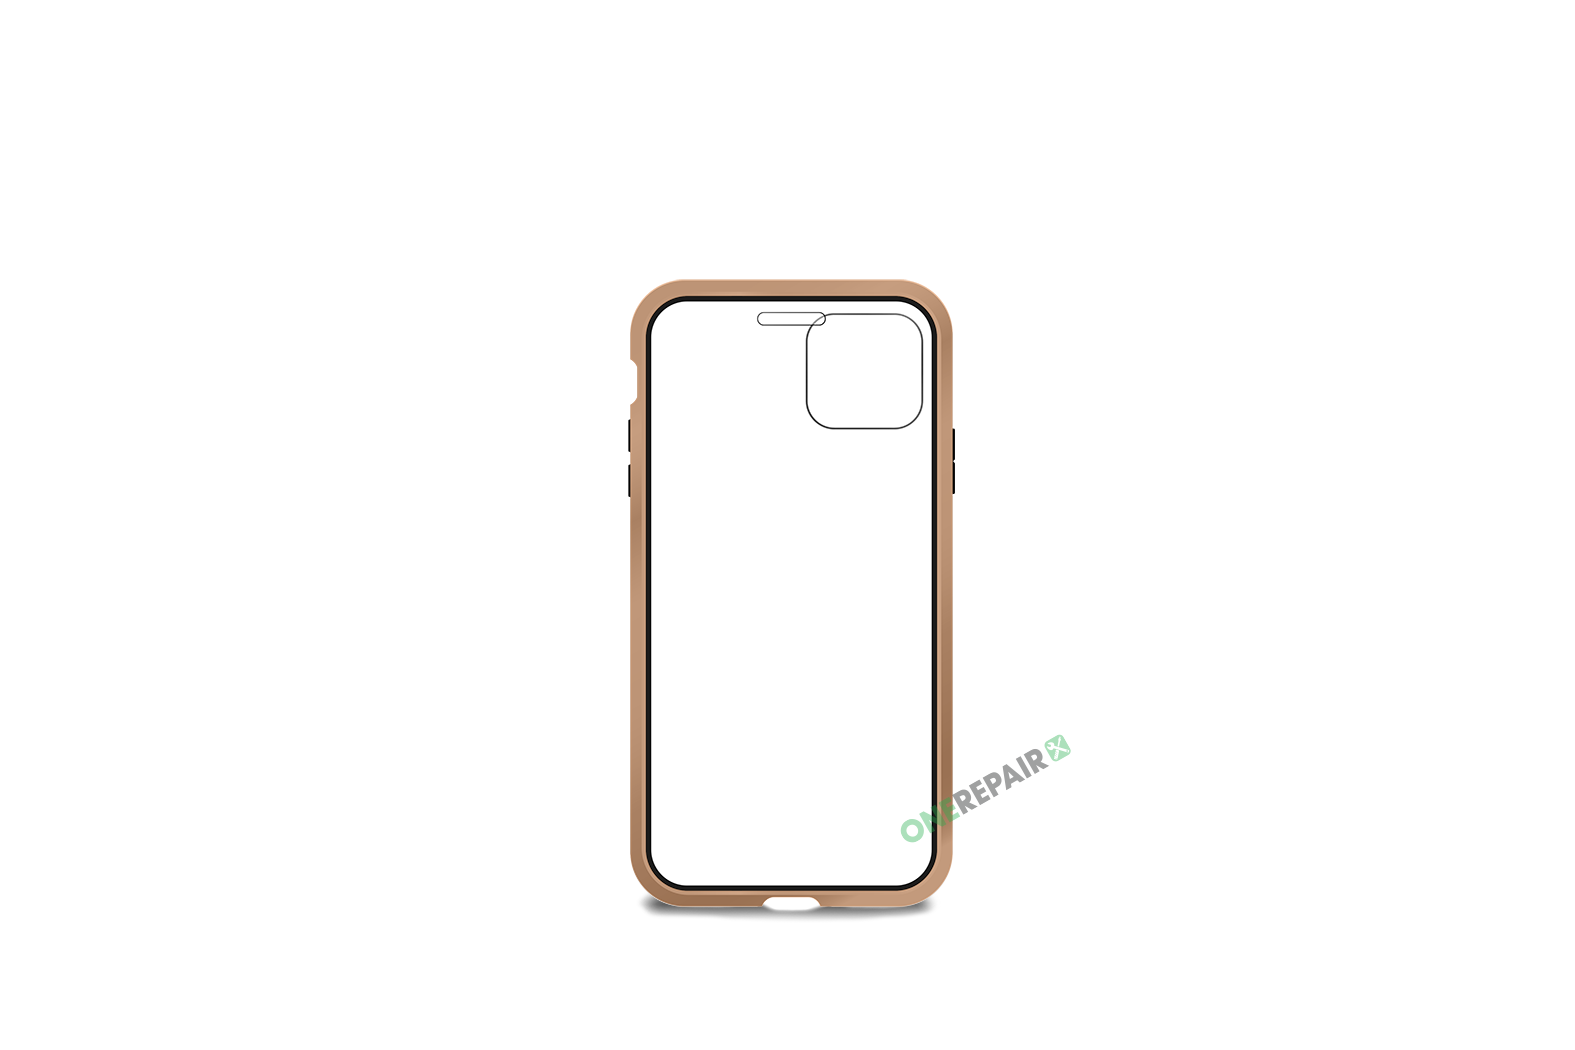 353789-002_iPhone_11_Pro_Magnetisk_Case_beige_OneRepair_00001